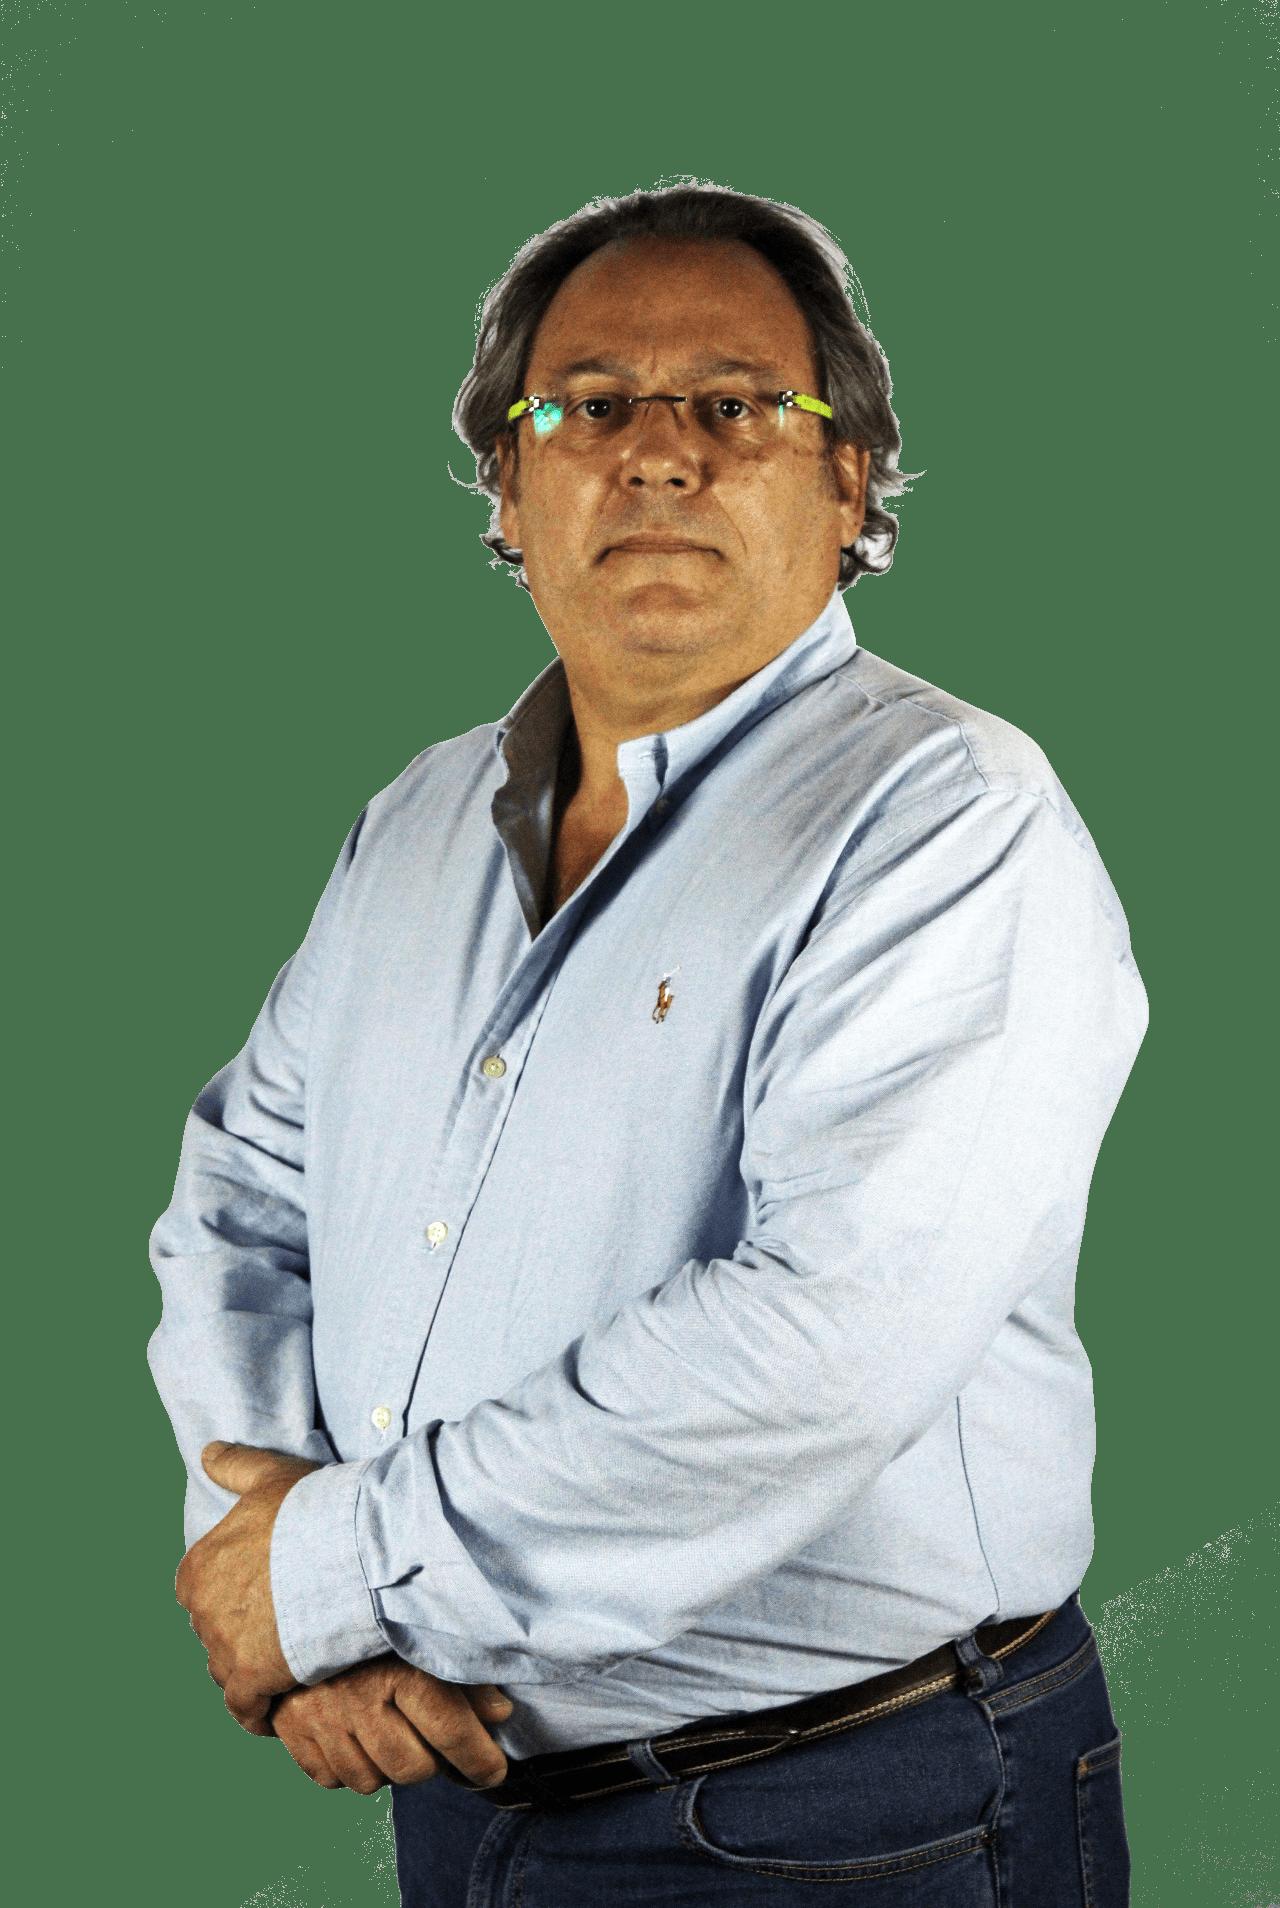 Mario Orta